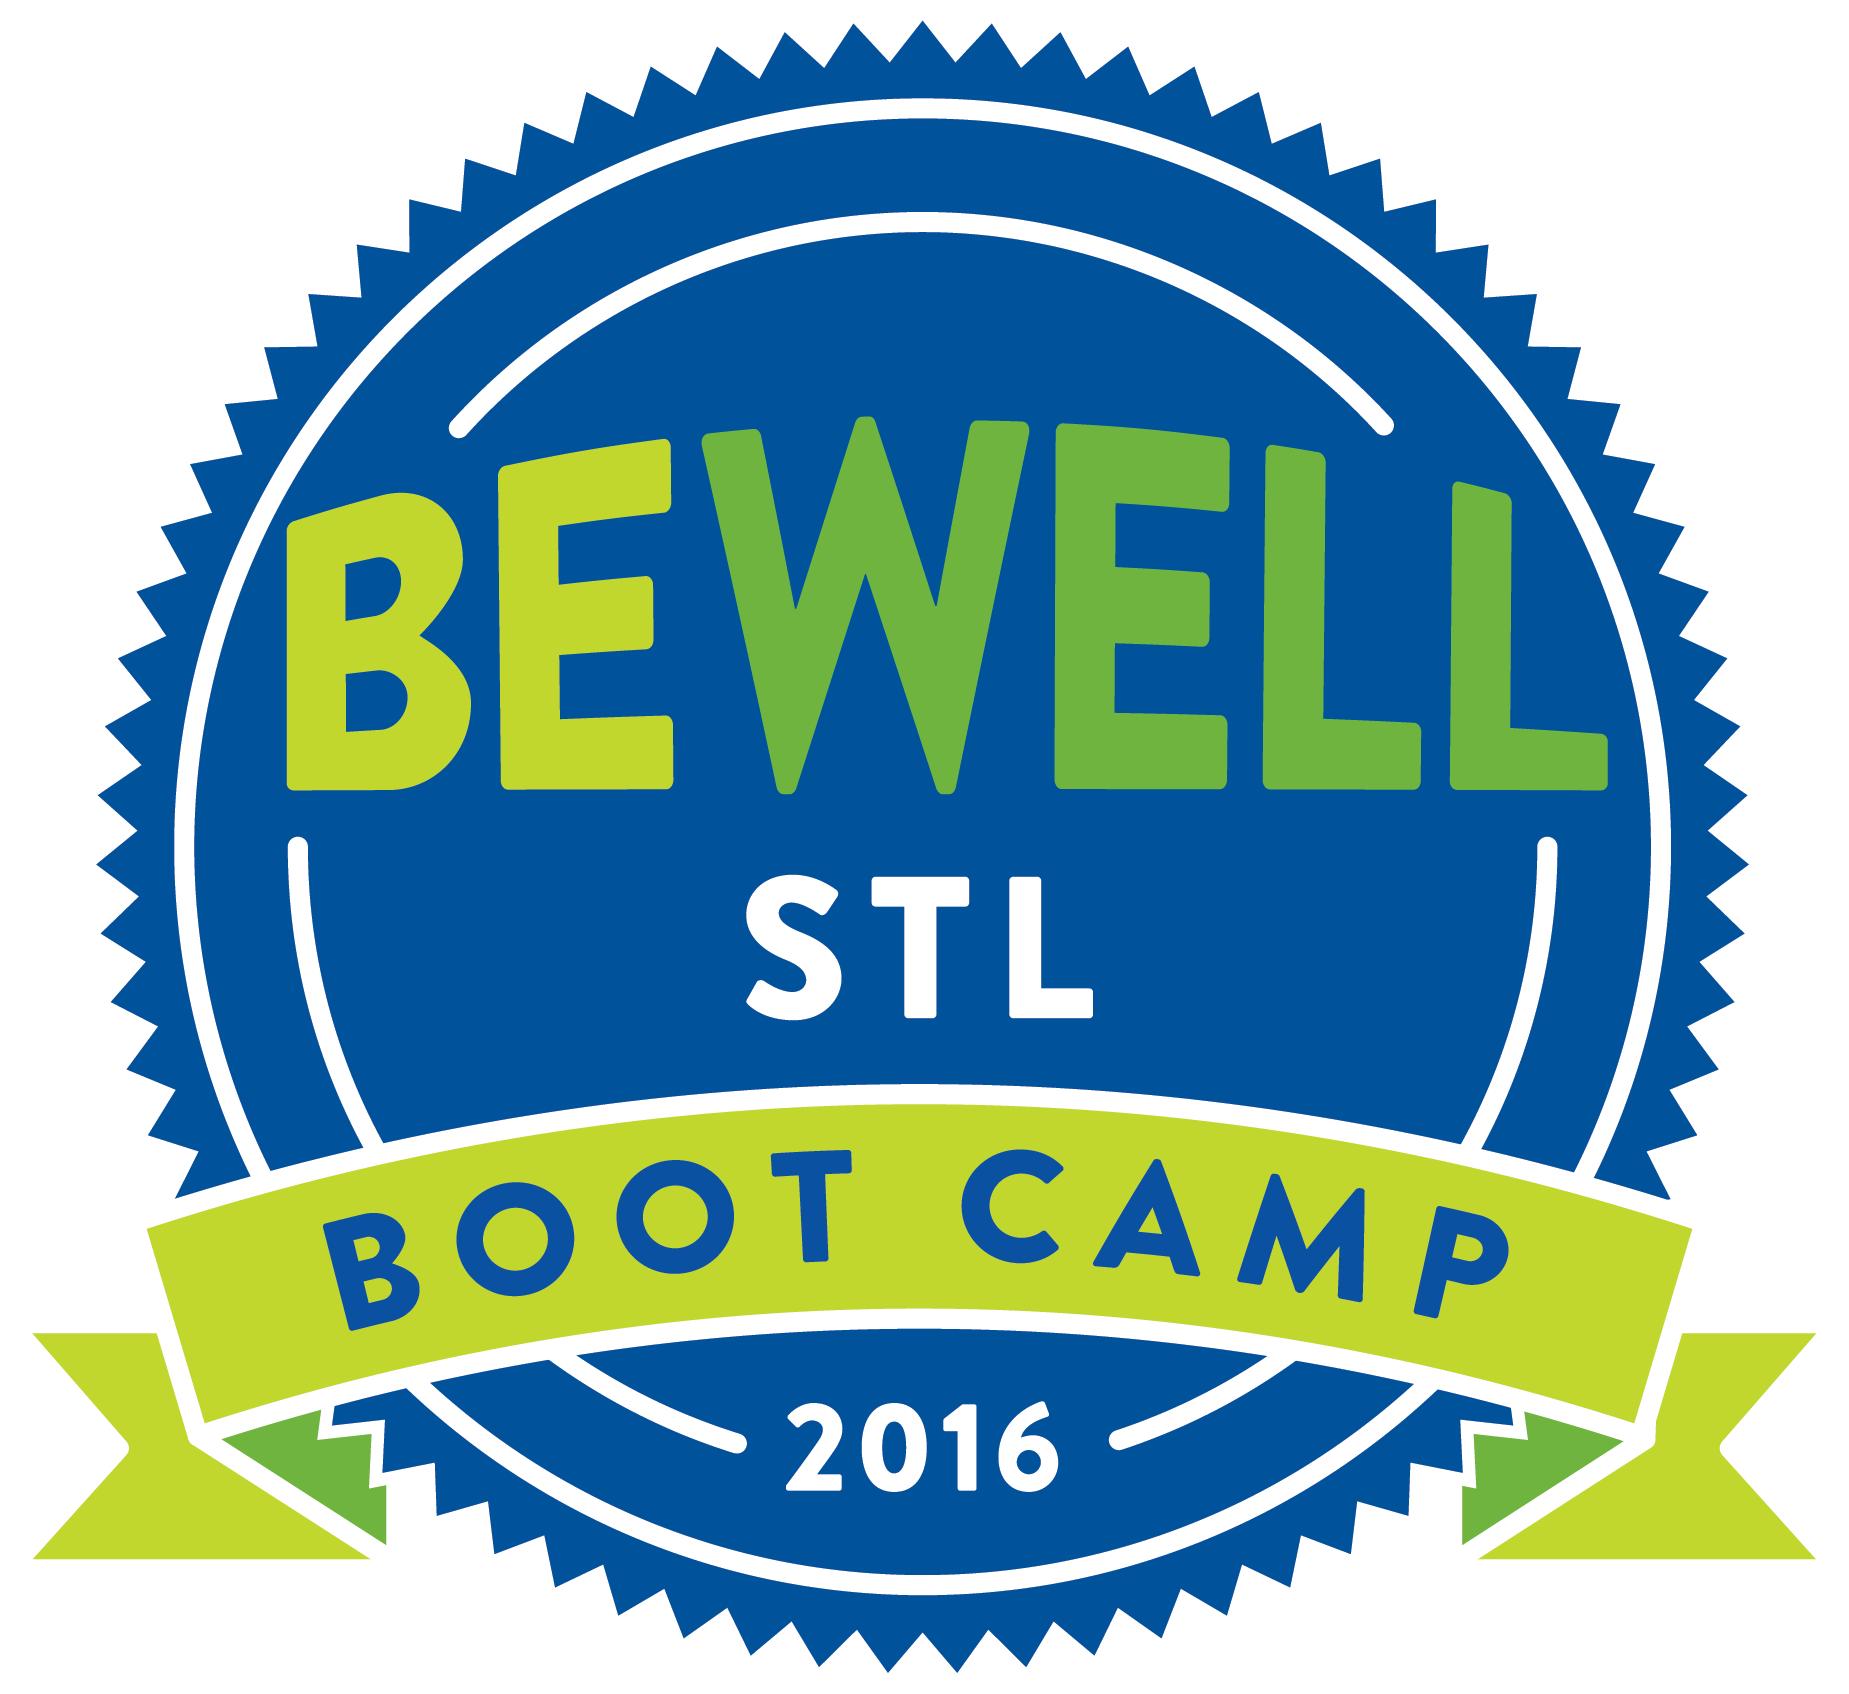 Bewell Finallogo Forweb Elemental Esthetics